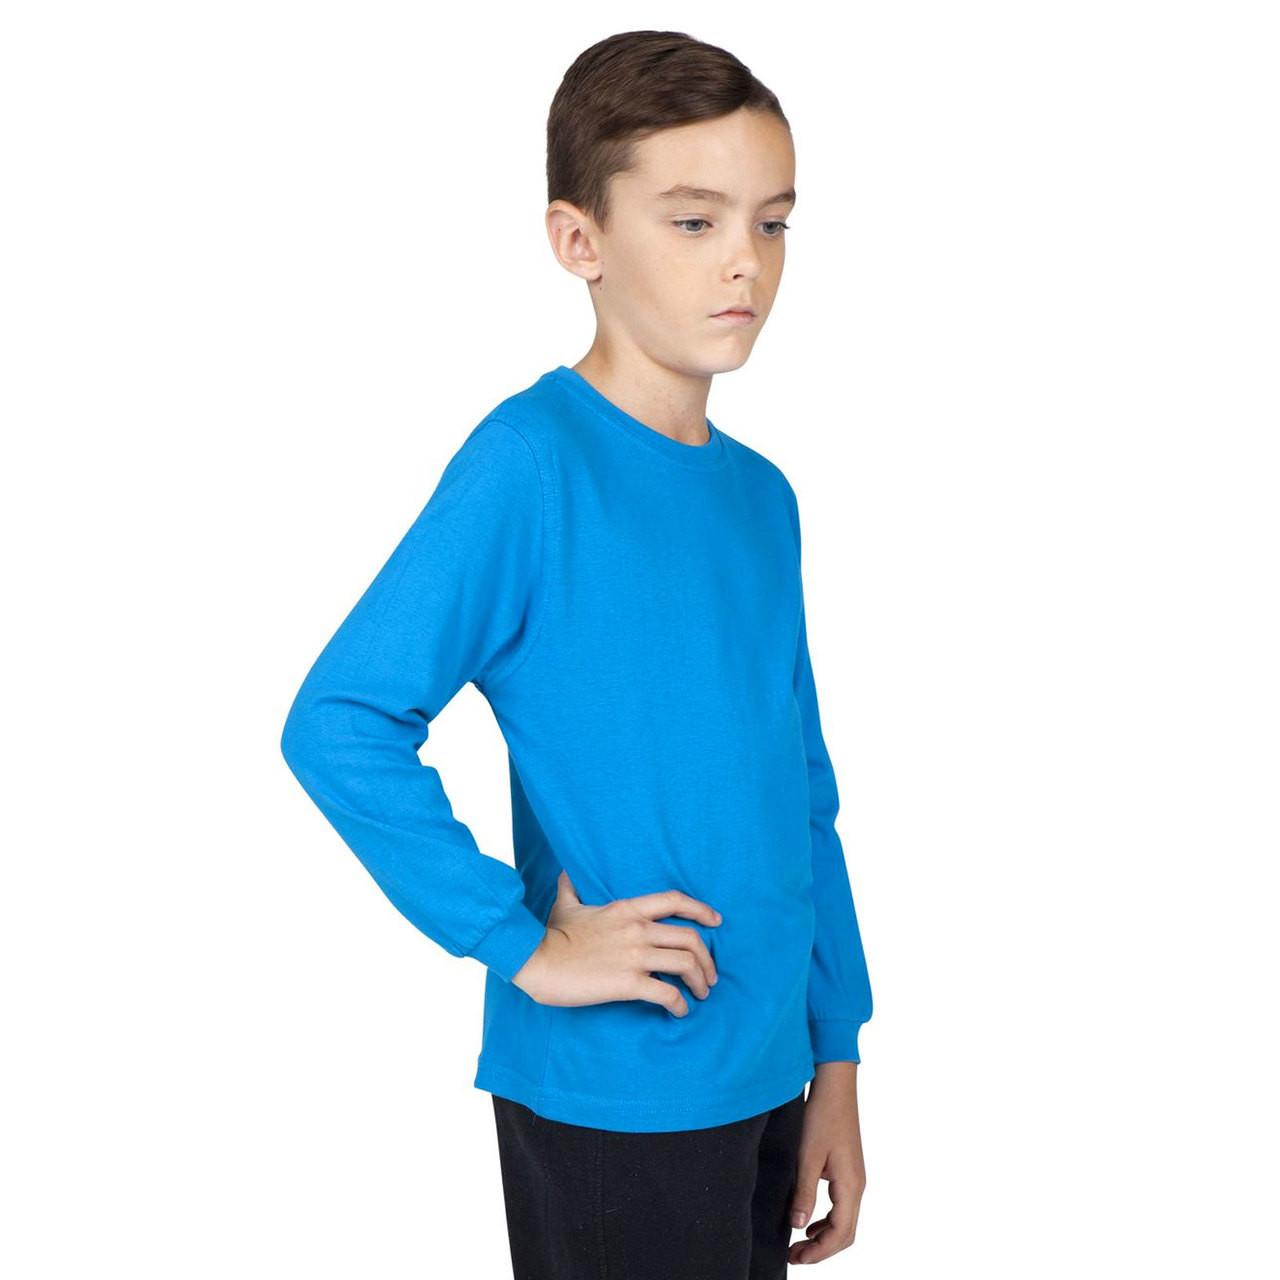 4307be2d0b35f FRANKIE   Kids T-Shirts Long Sleeves